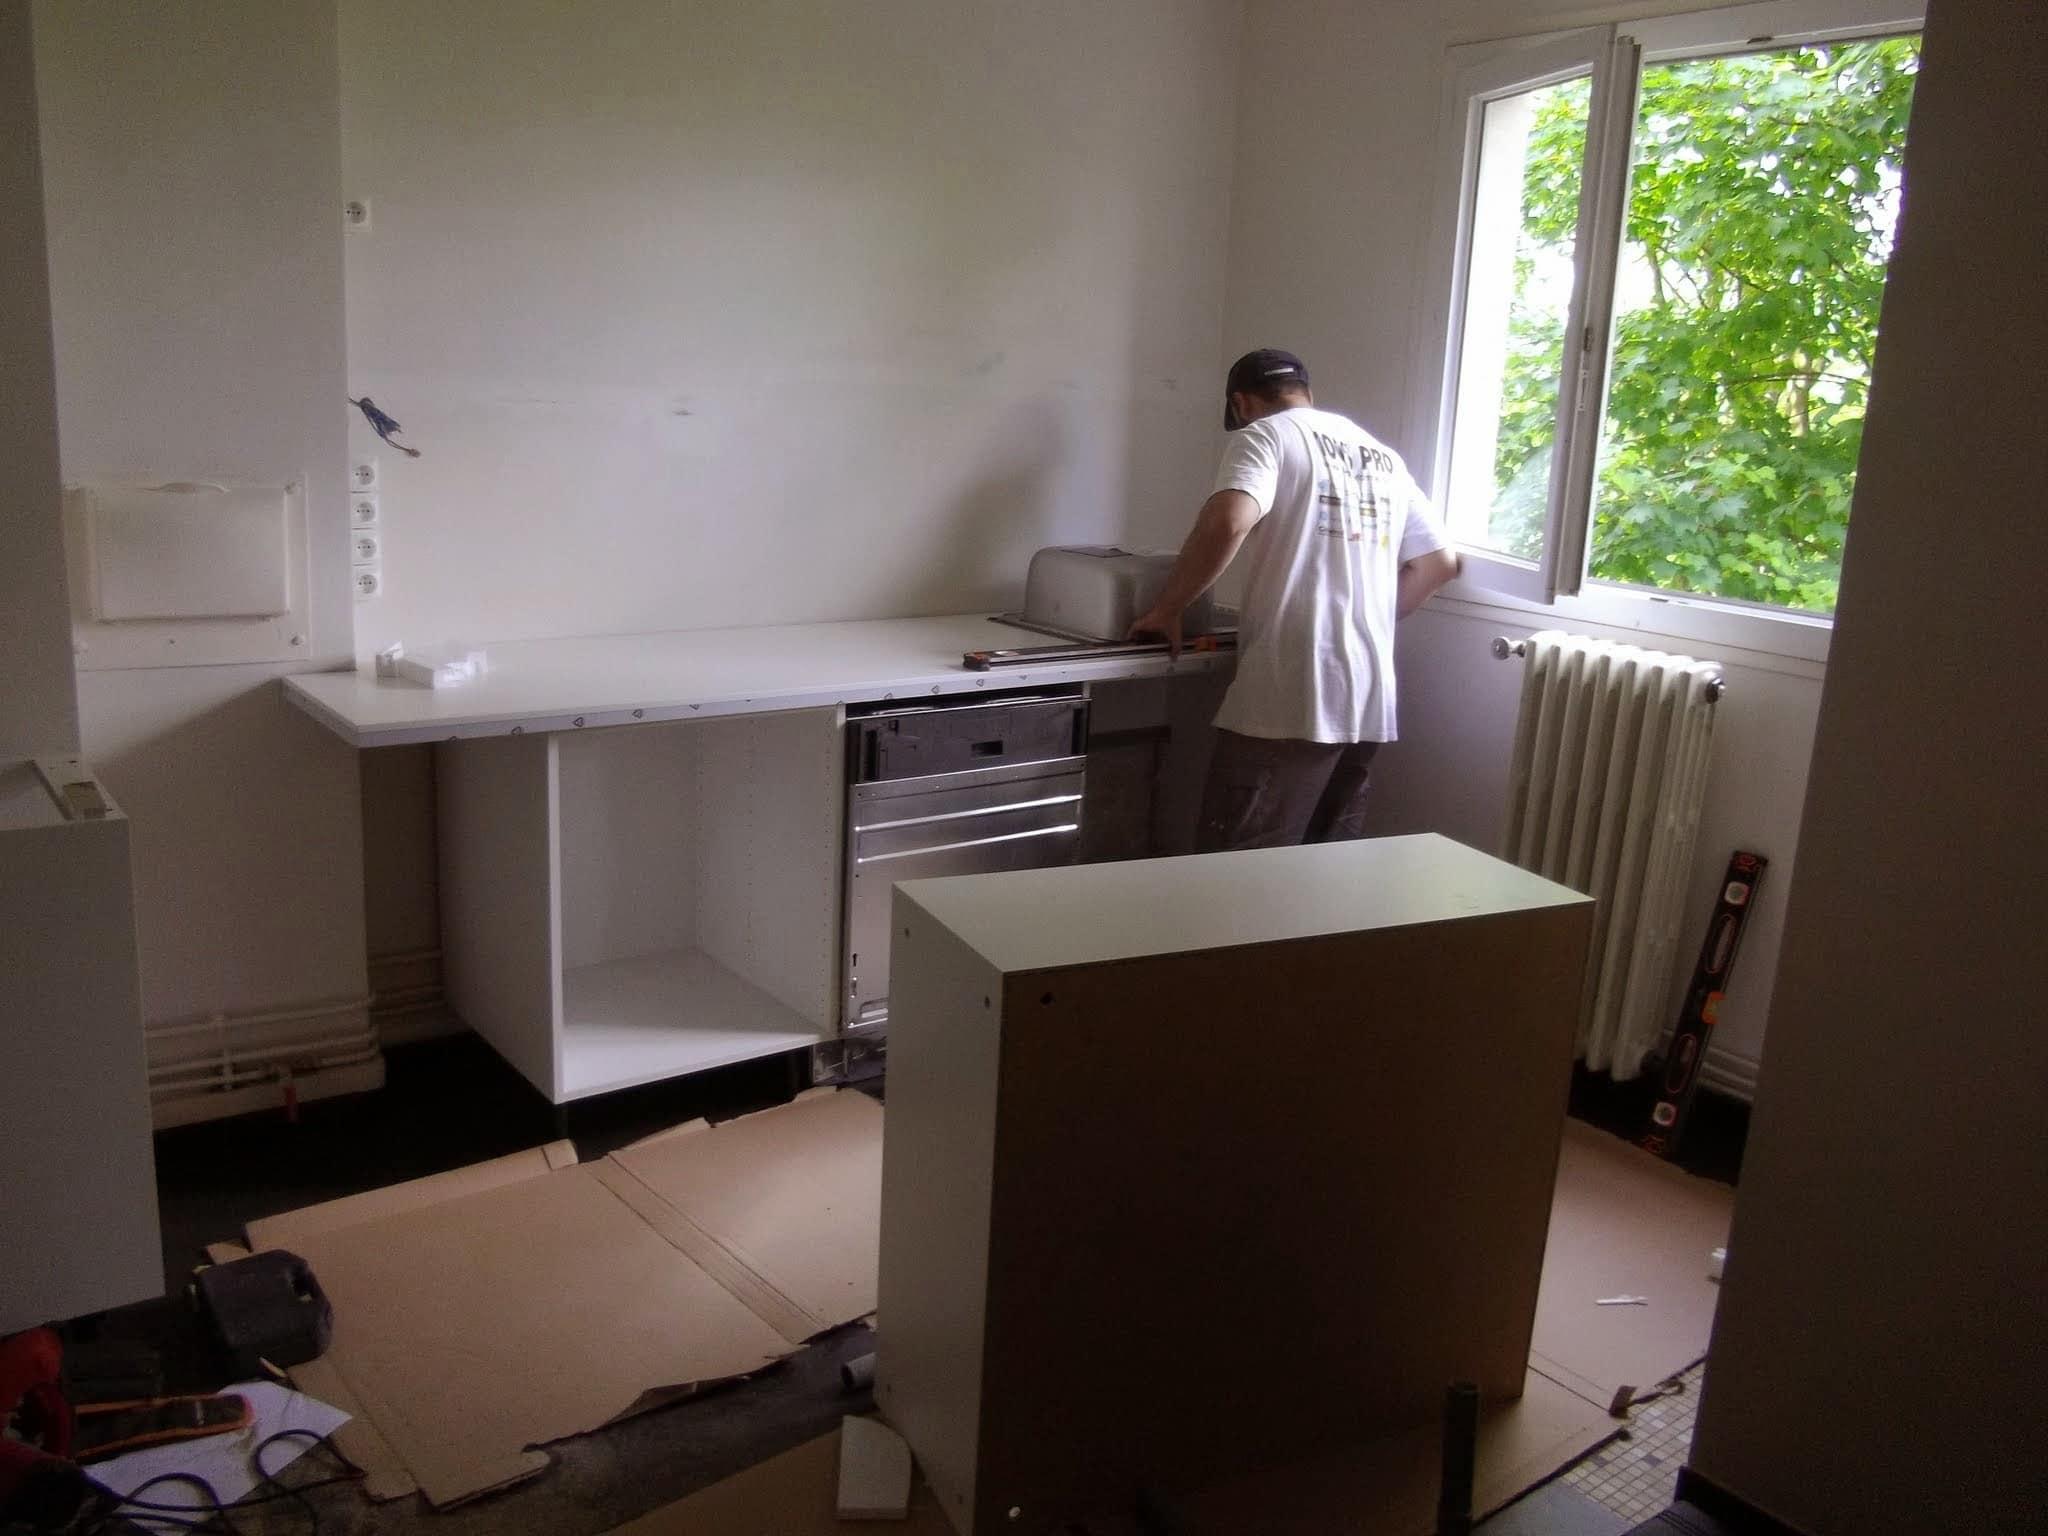 avaux-renovation-interieure-motrntage-pose-cuisine-equipee-cuisiniste-poseur-menuisier-94-val_de_marne-ile_de_france-saber_multi_services (4)